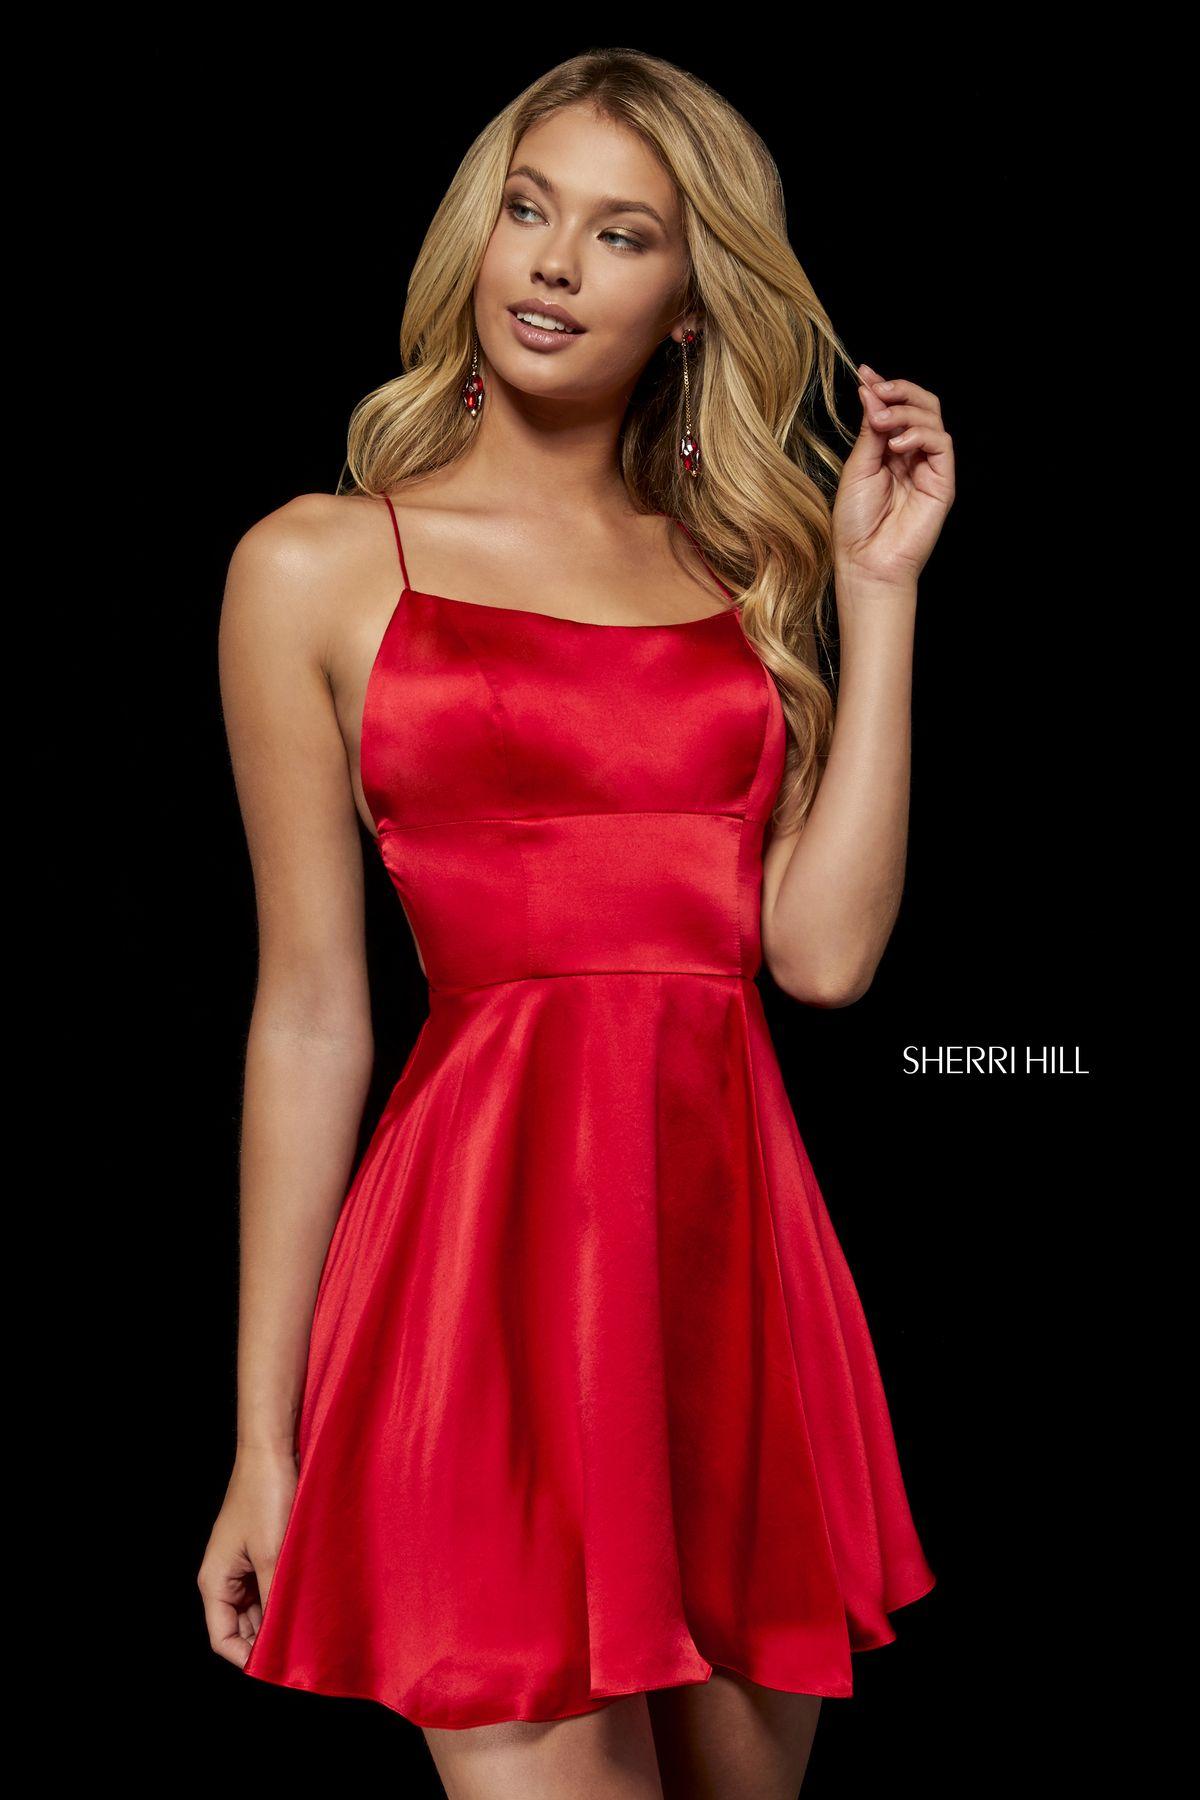 c529a6bc324 Style  52156 – Sherri Hill. Style  52156 – Sherri Hill Emerald Homecoming  Dress ...